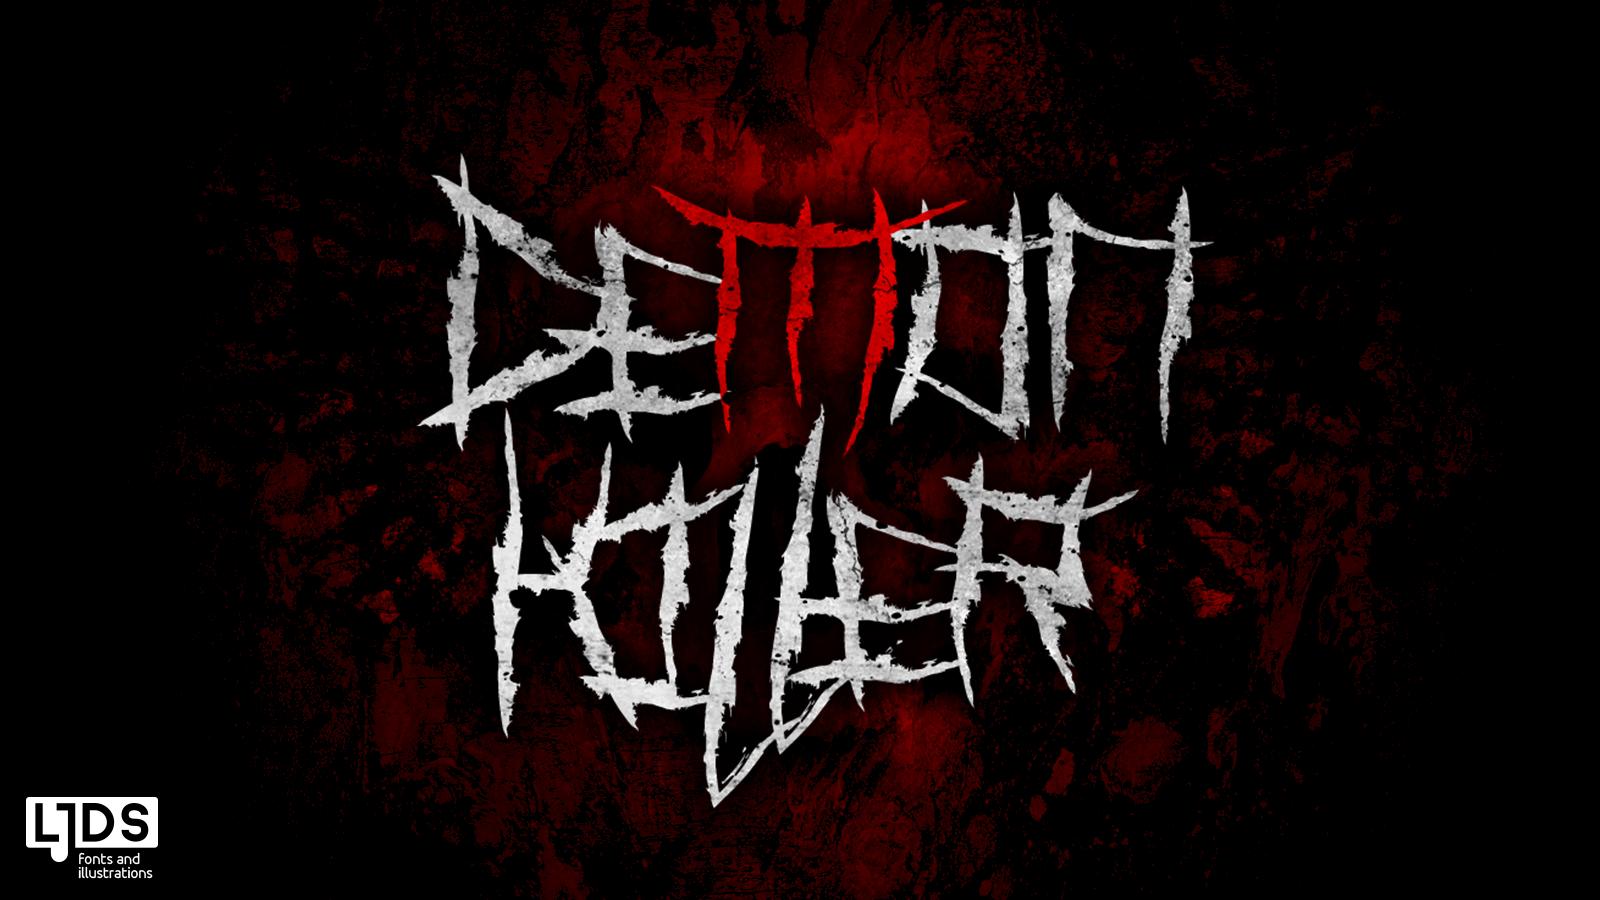 Demon Killer example image 1